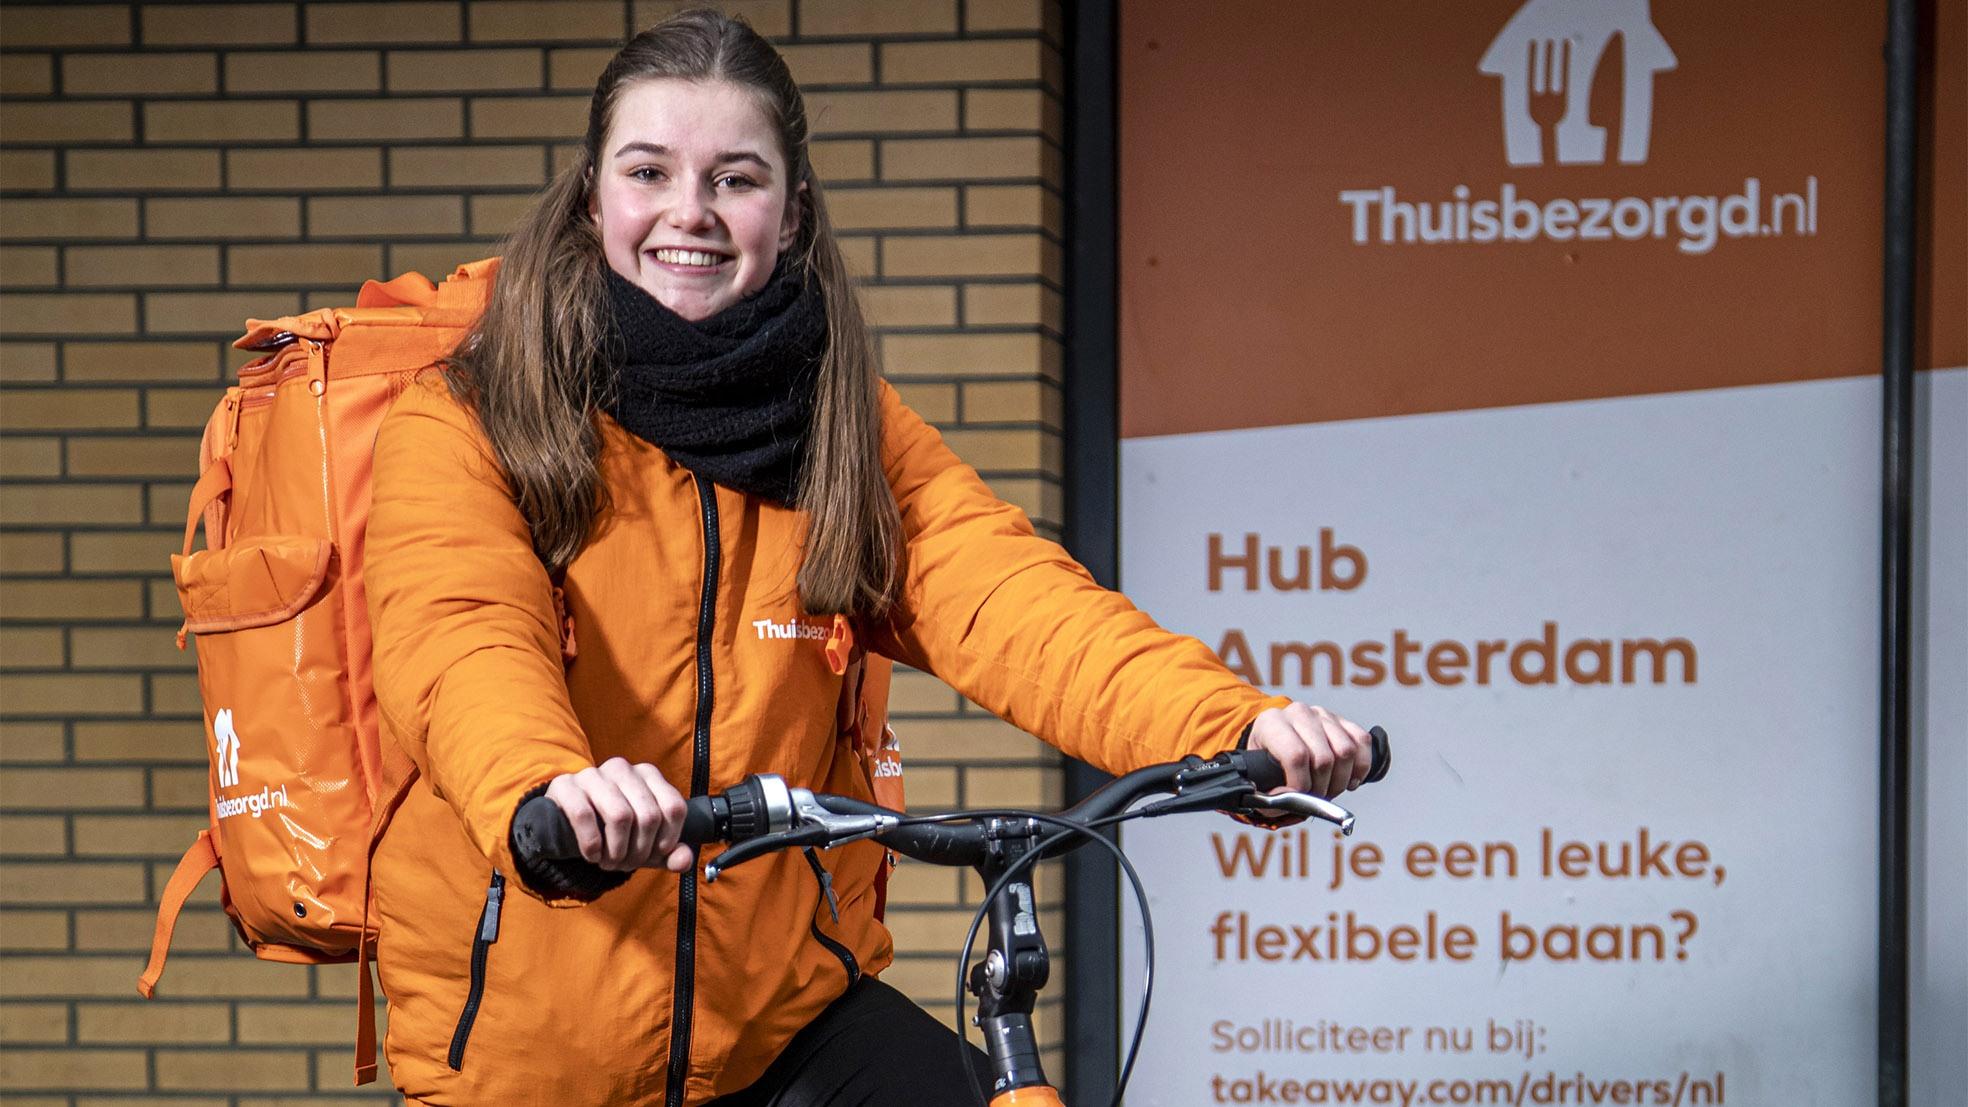 Thuisbezorgd Tessa Amsterdam